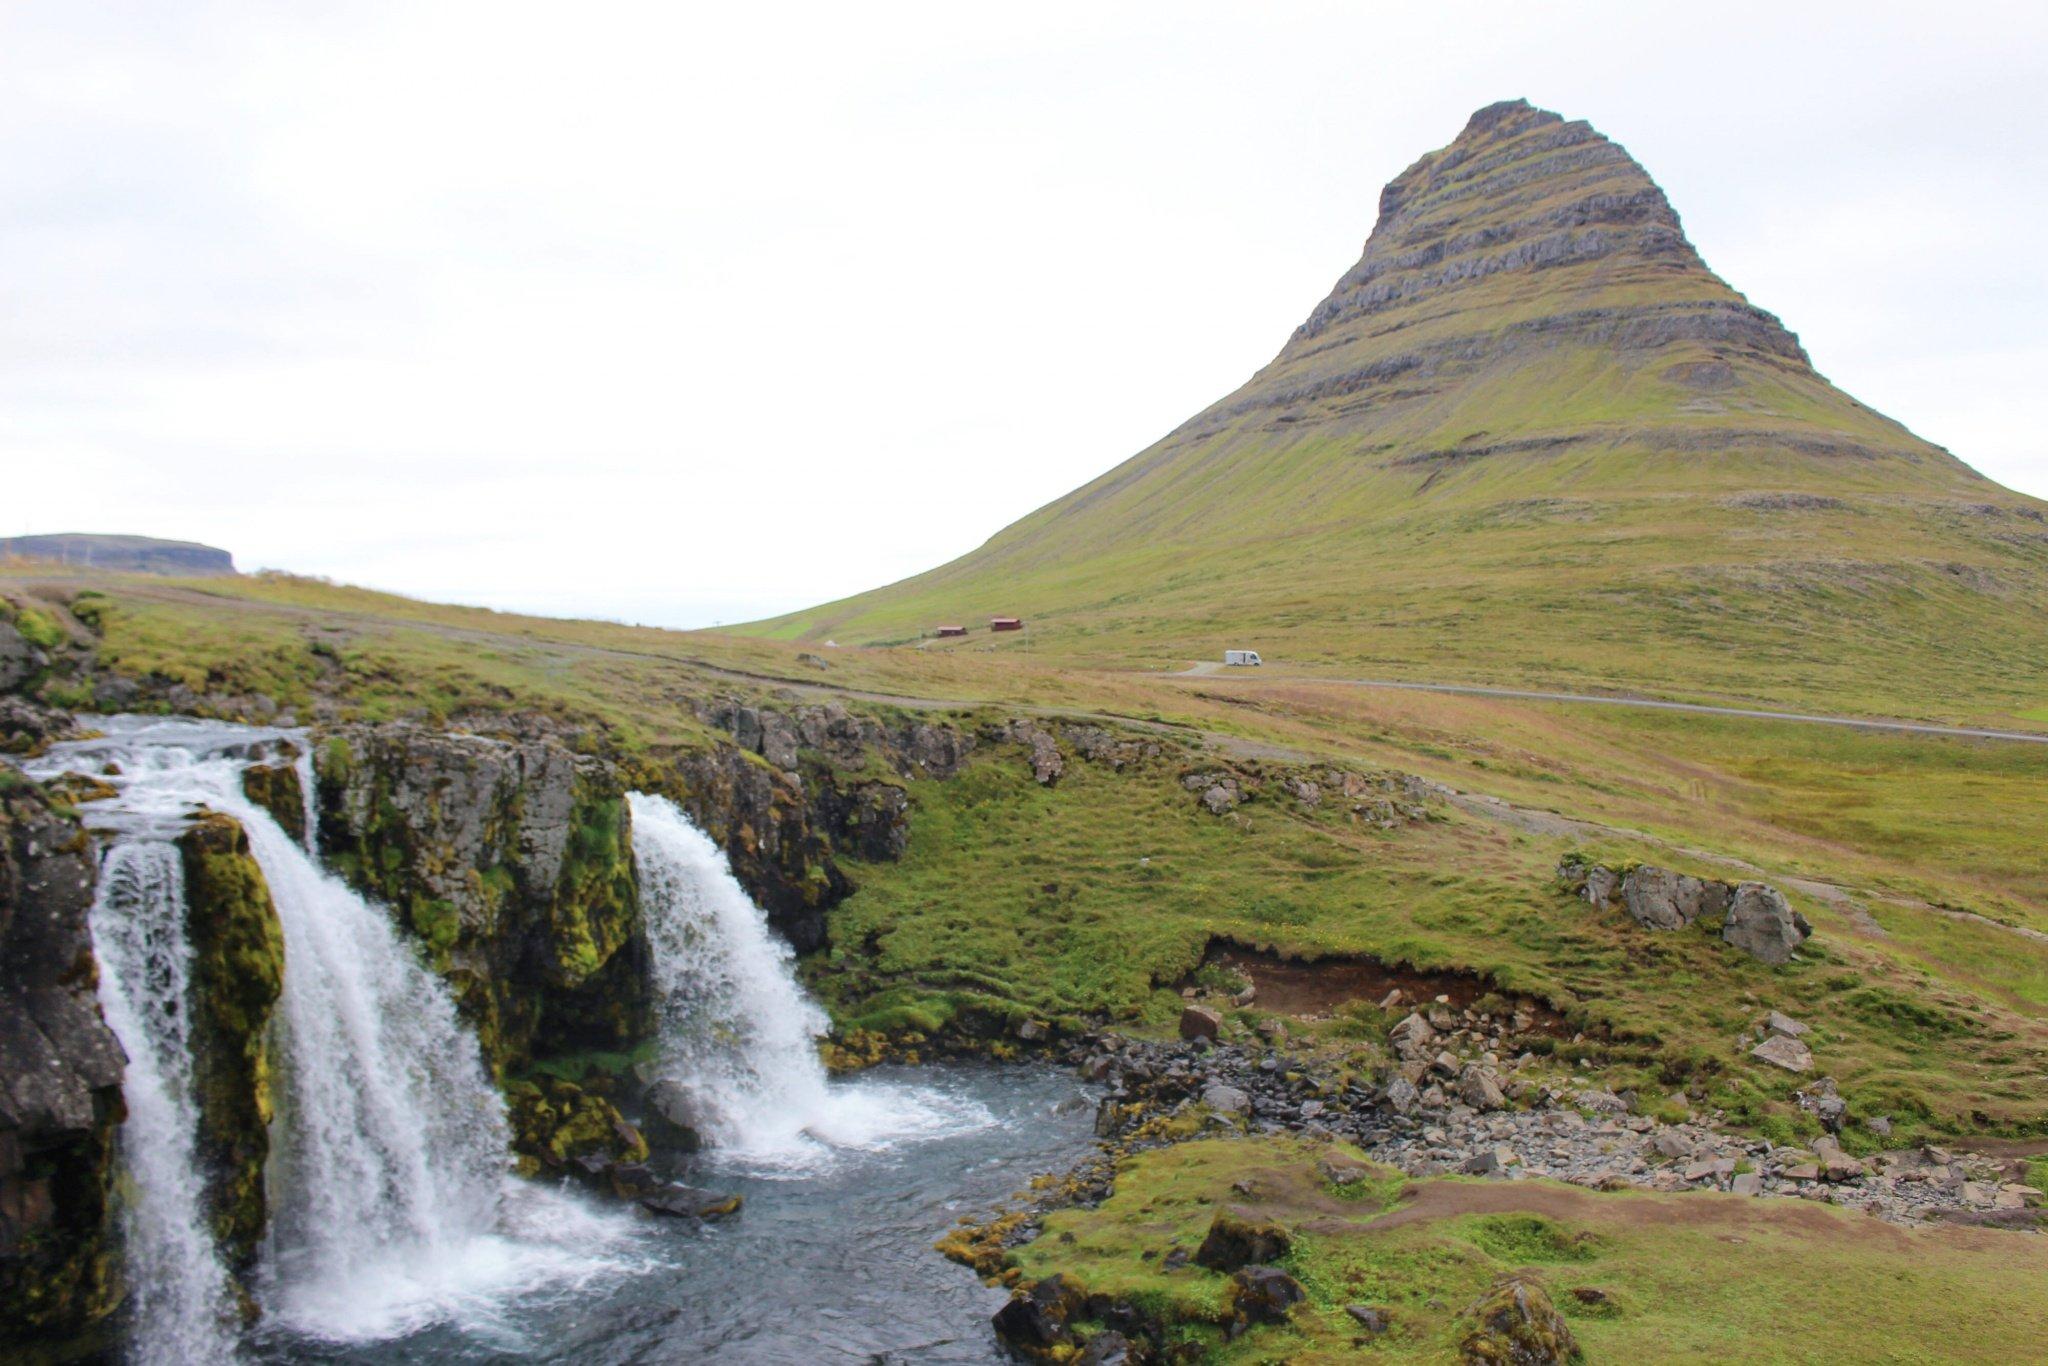 Snæfellsnes Peninsula: Iceland in Miniature